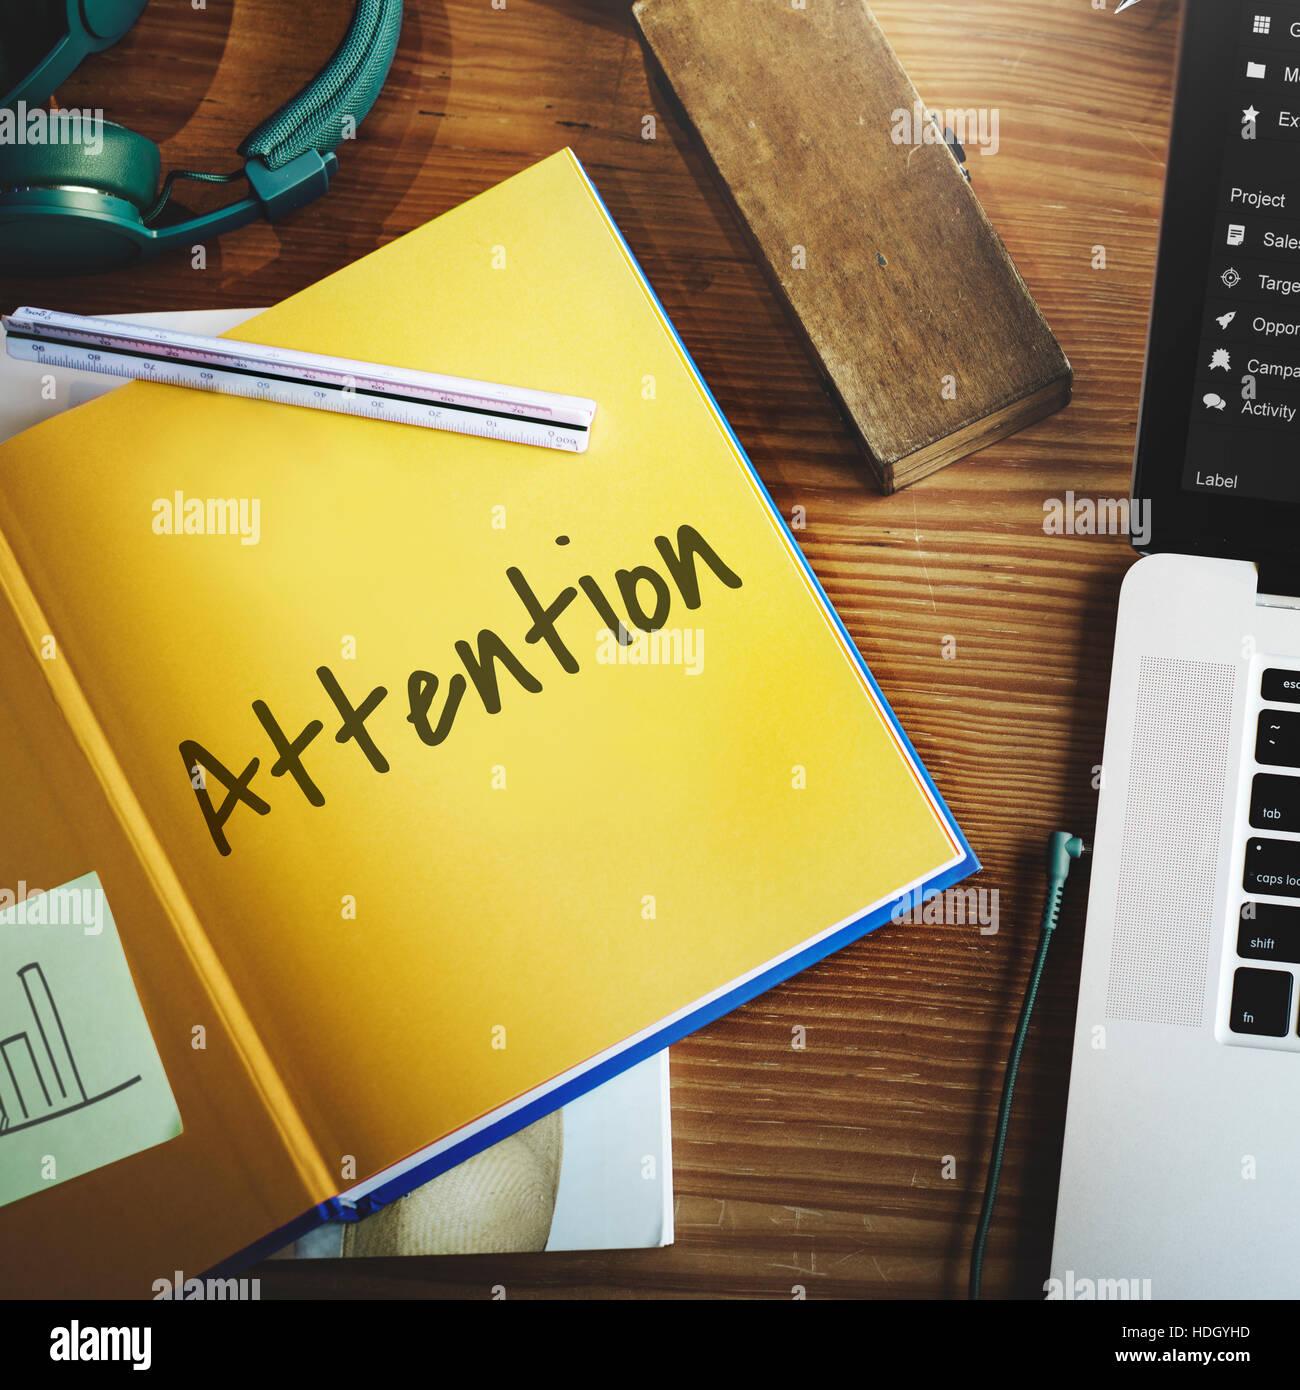 Attention Urgent Planner Agenda Concept Stock Photo